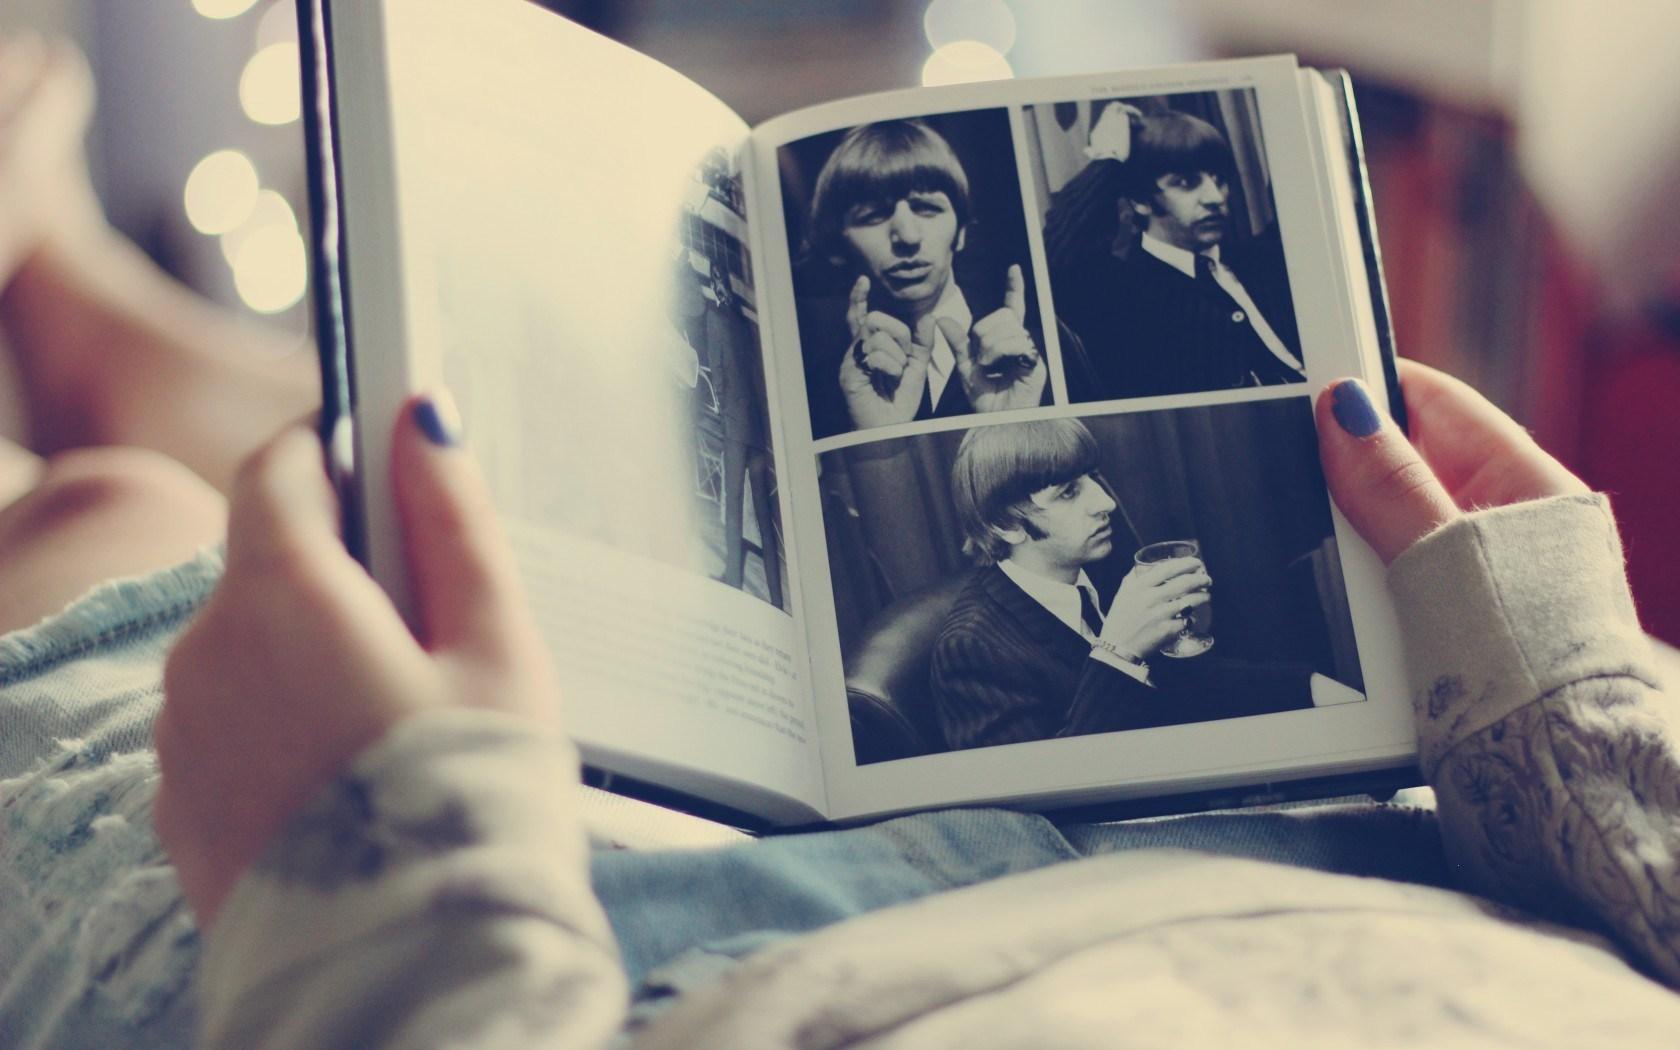 The Beatles Ringo Starr Richard Starkey Book Photo